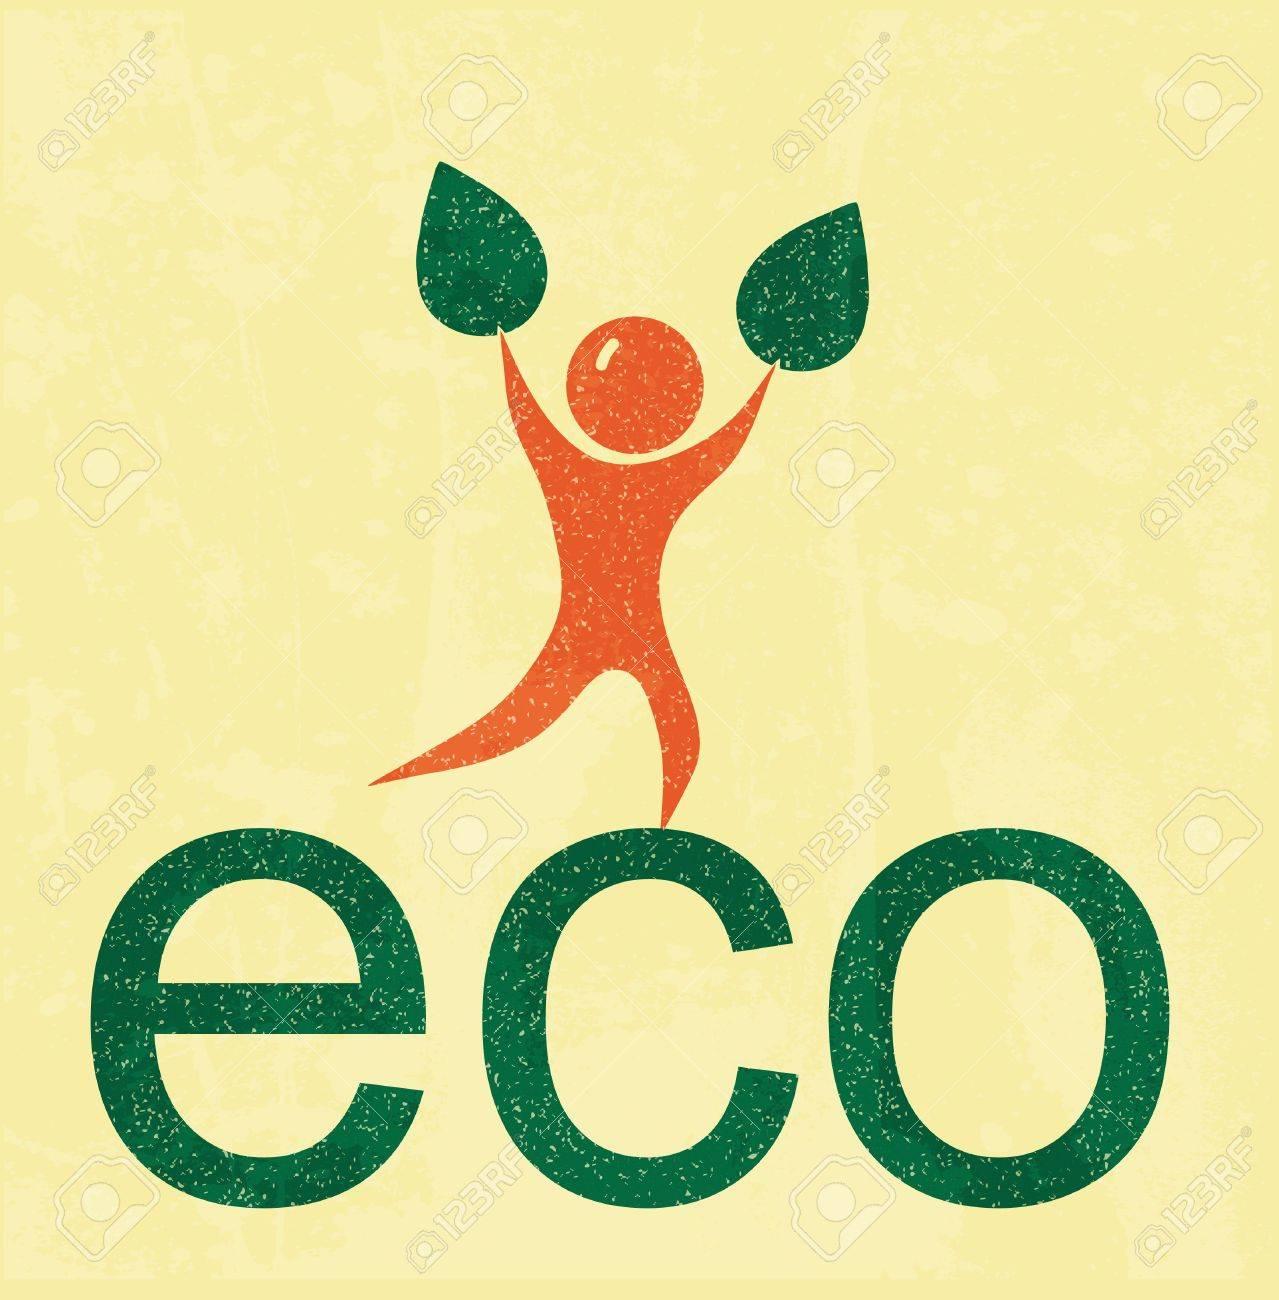 Eco man. retro poster Stock Vector - 11987136